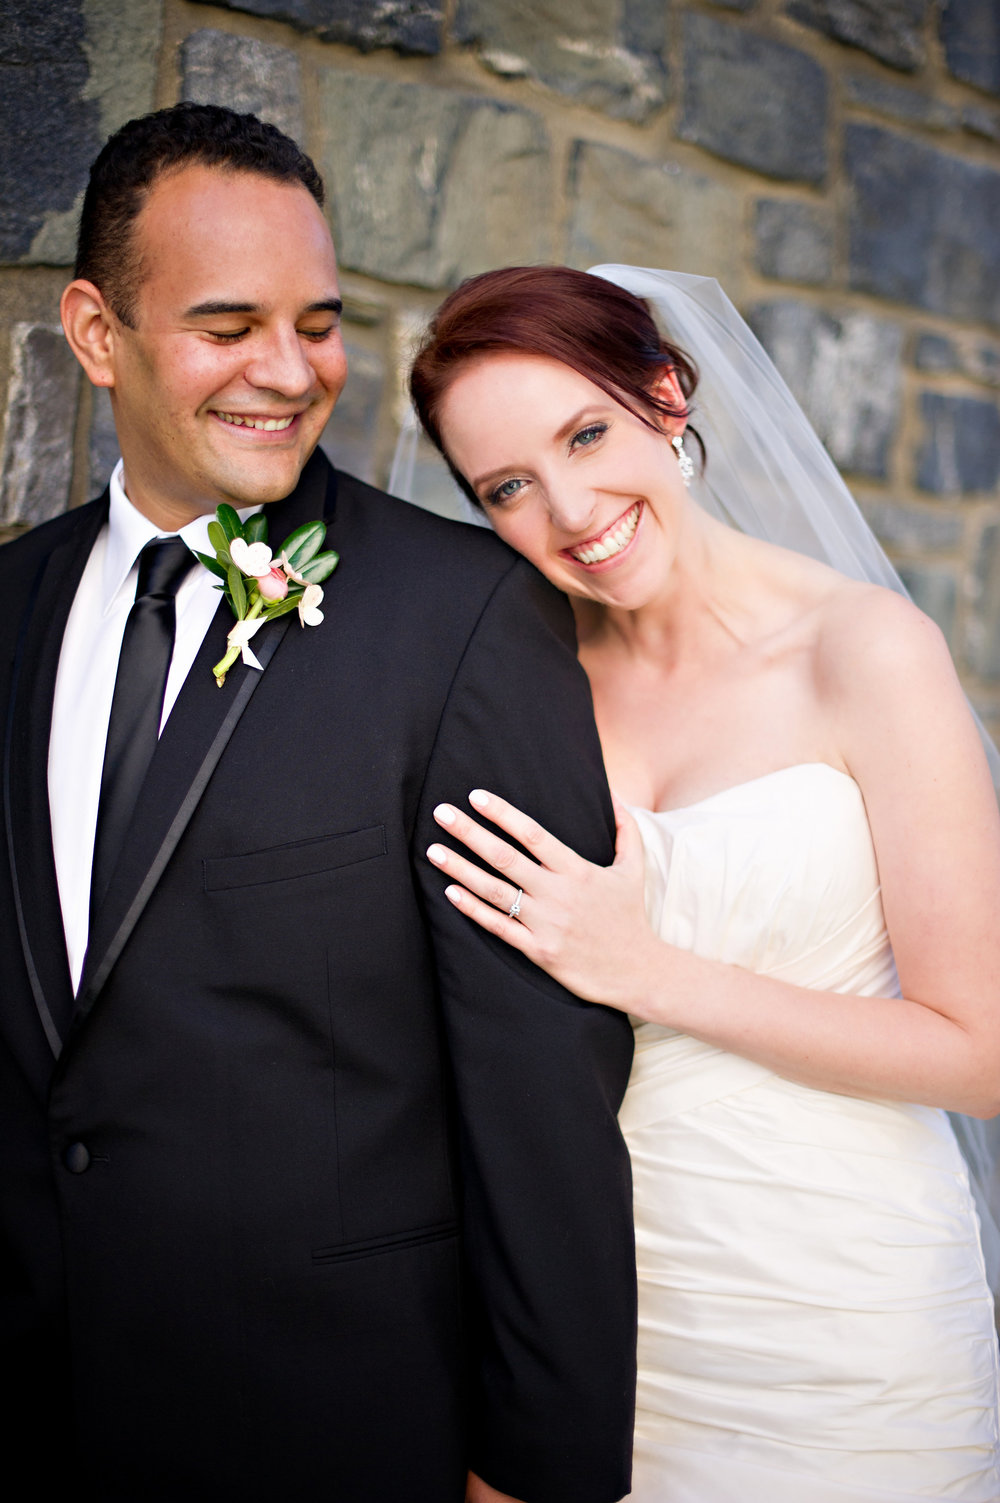 CT_Wedding_Planner_Crabtree_Kittle_House012.jpg